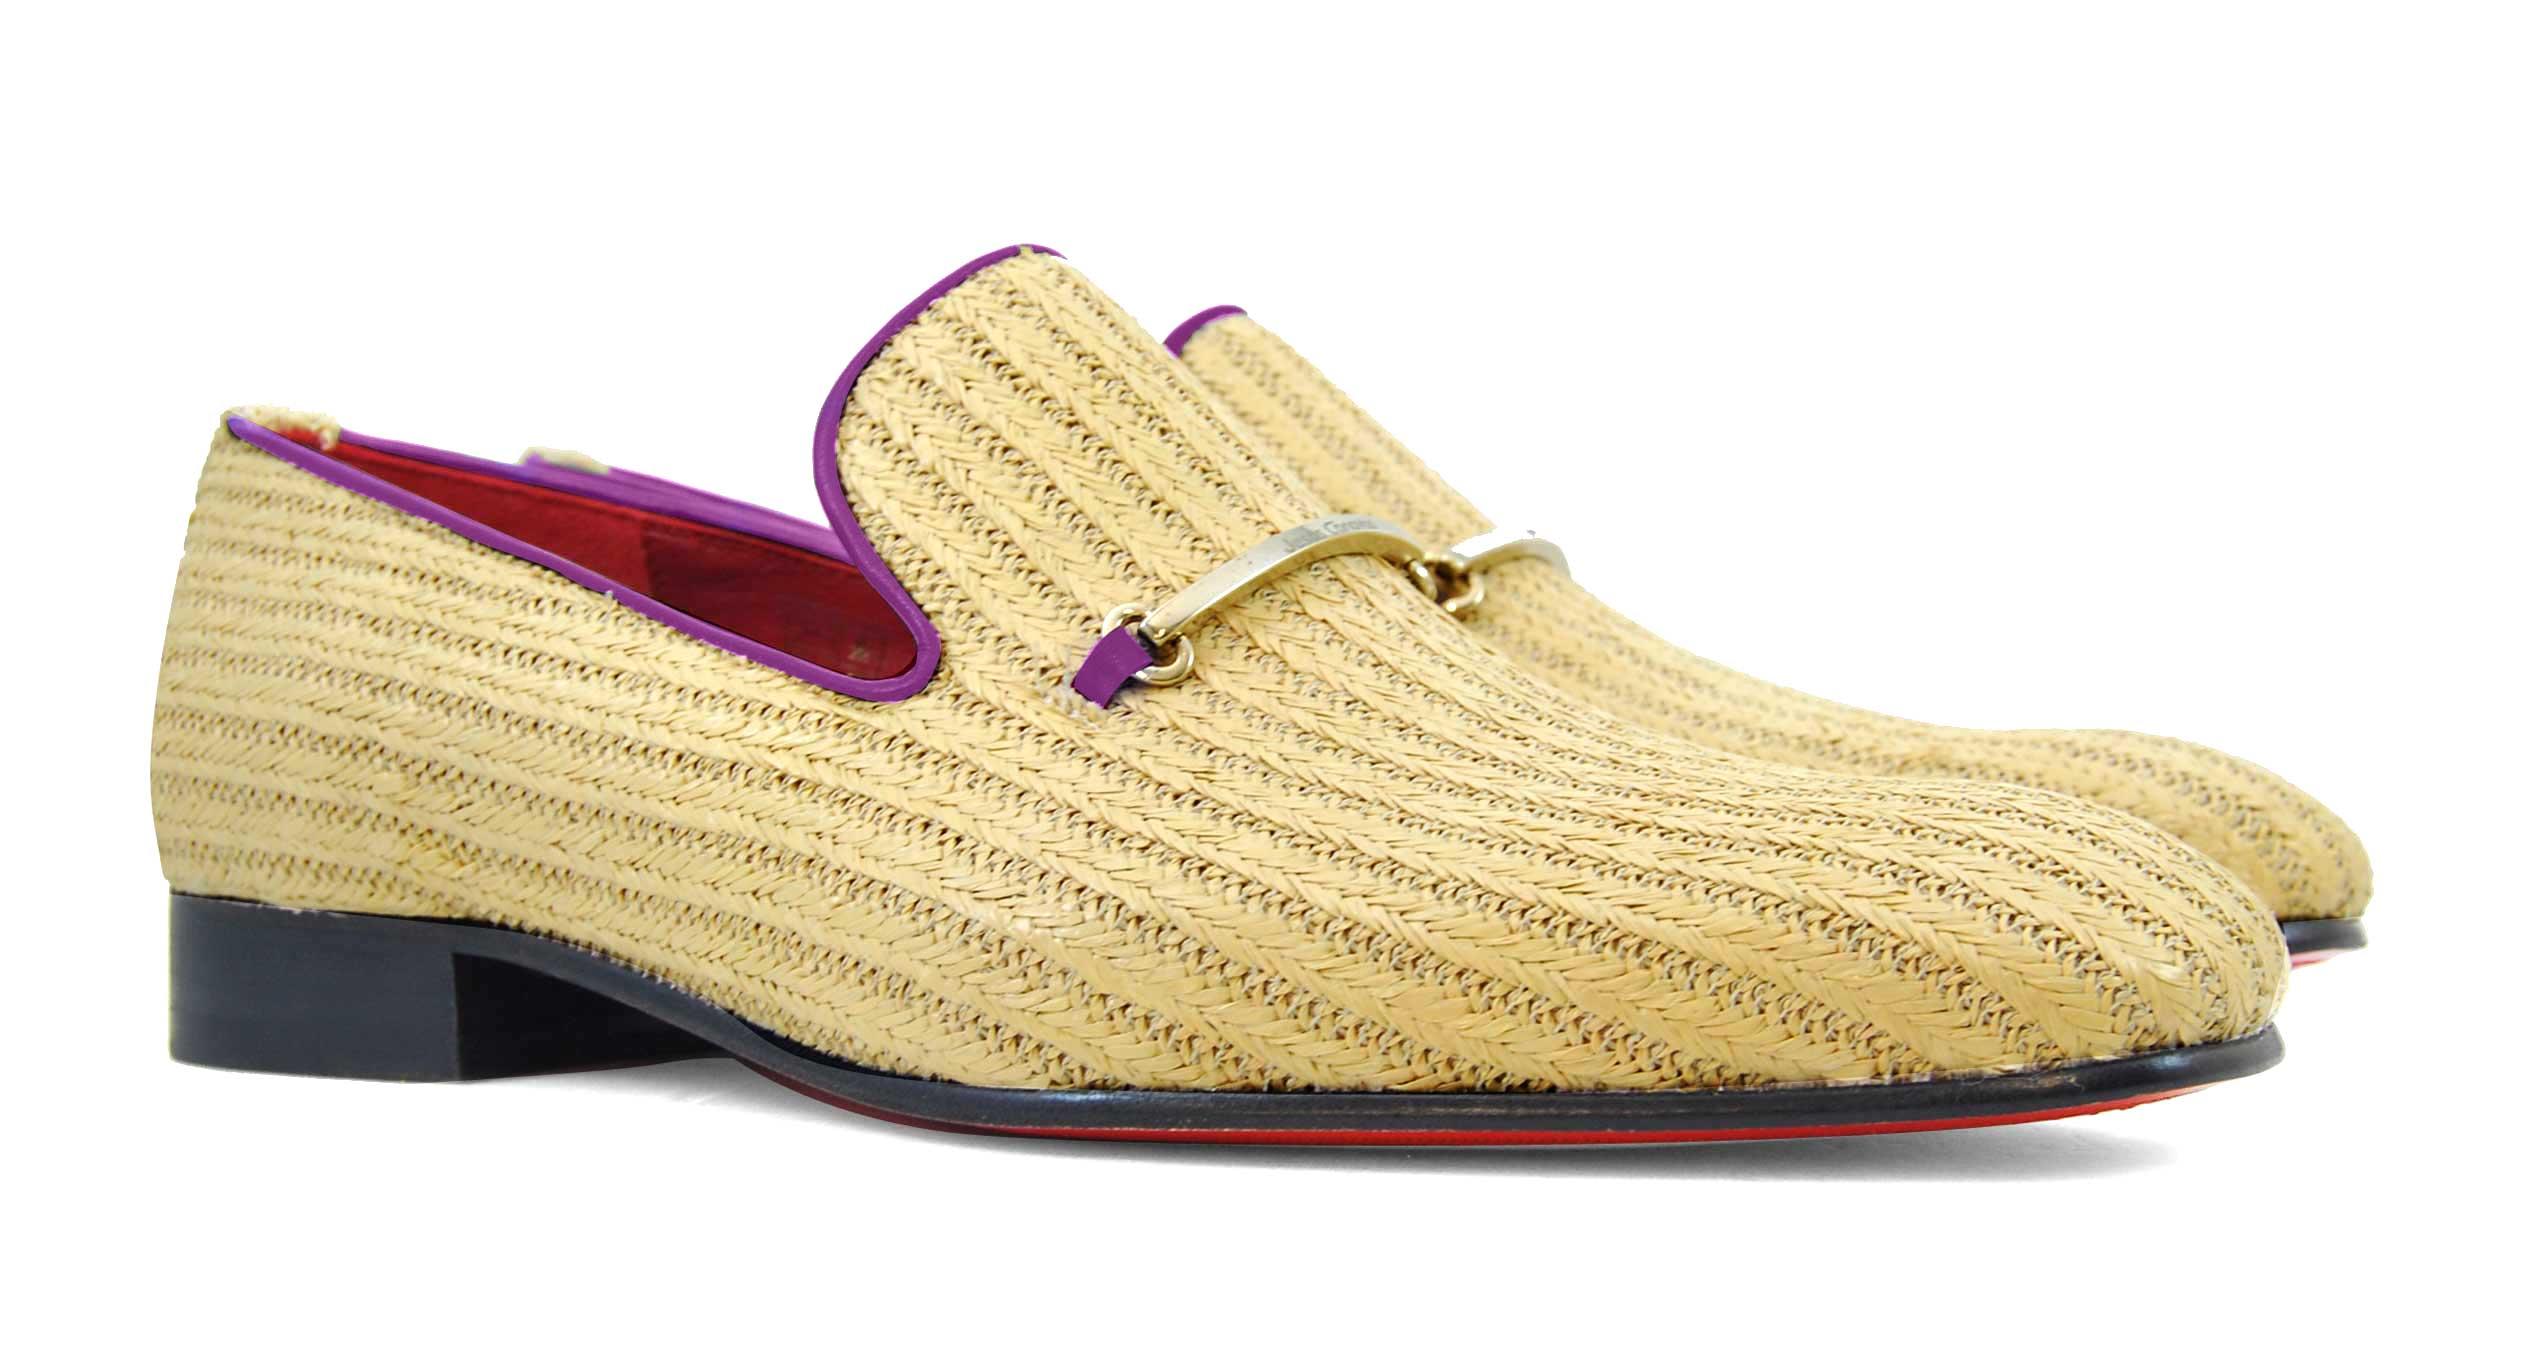 Foto 5 de Zapatos Palma Panameña Con Ribete Morado